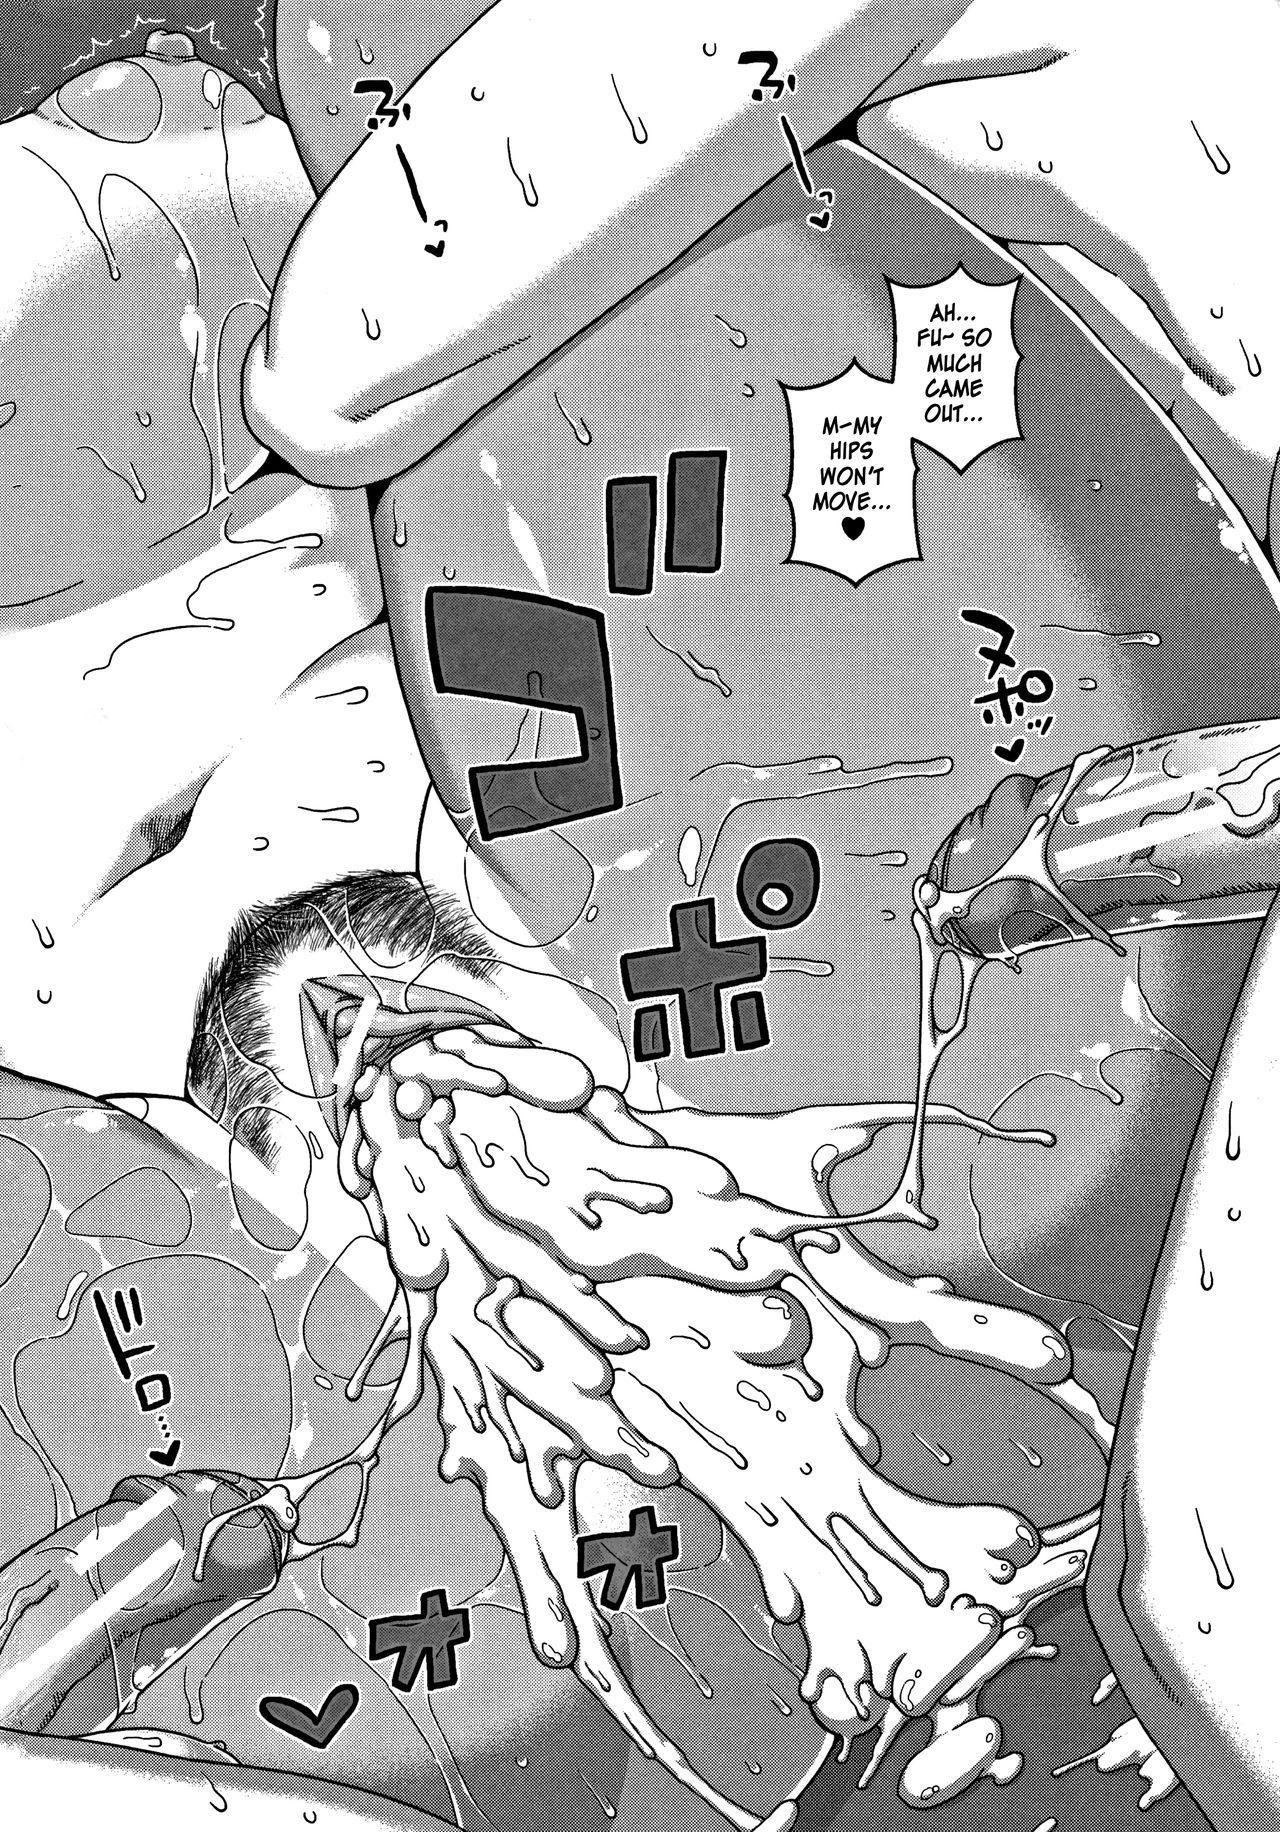 [Takatsu] Hitozuma A-san to Musuko no Yuujin N-kun - Married wife A and son's friend N-kun [English] 141